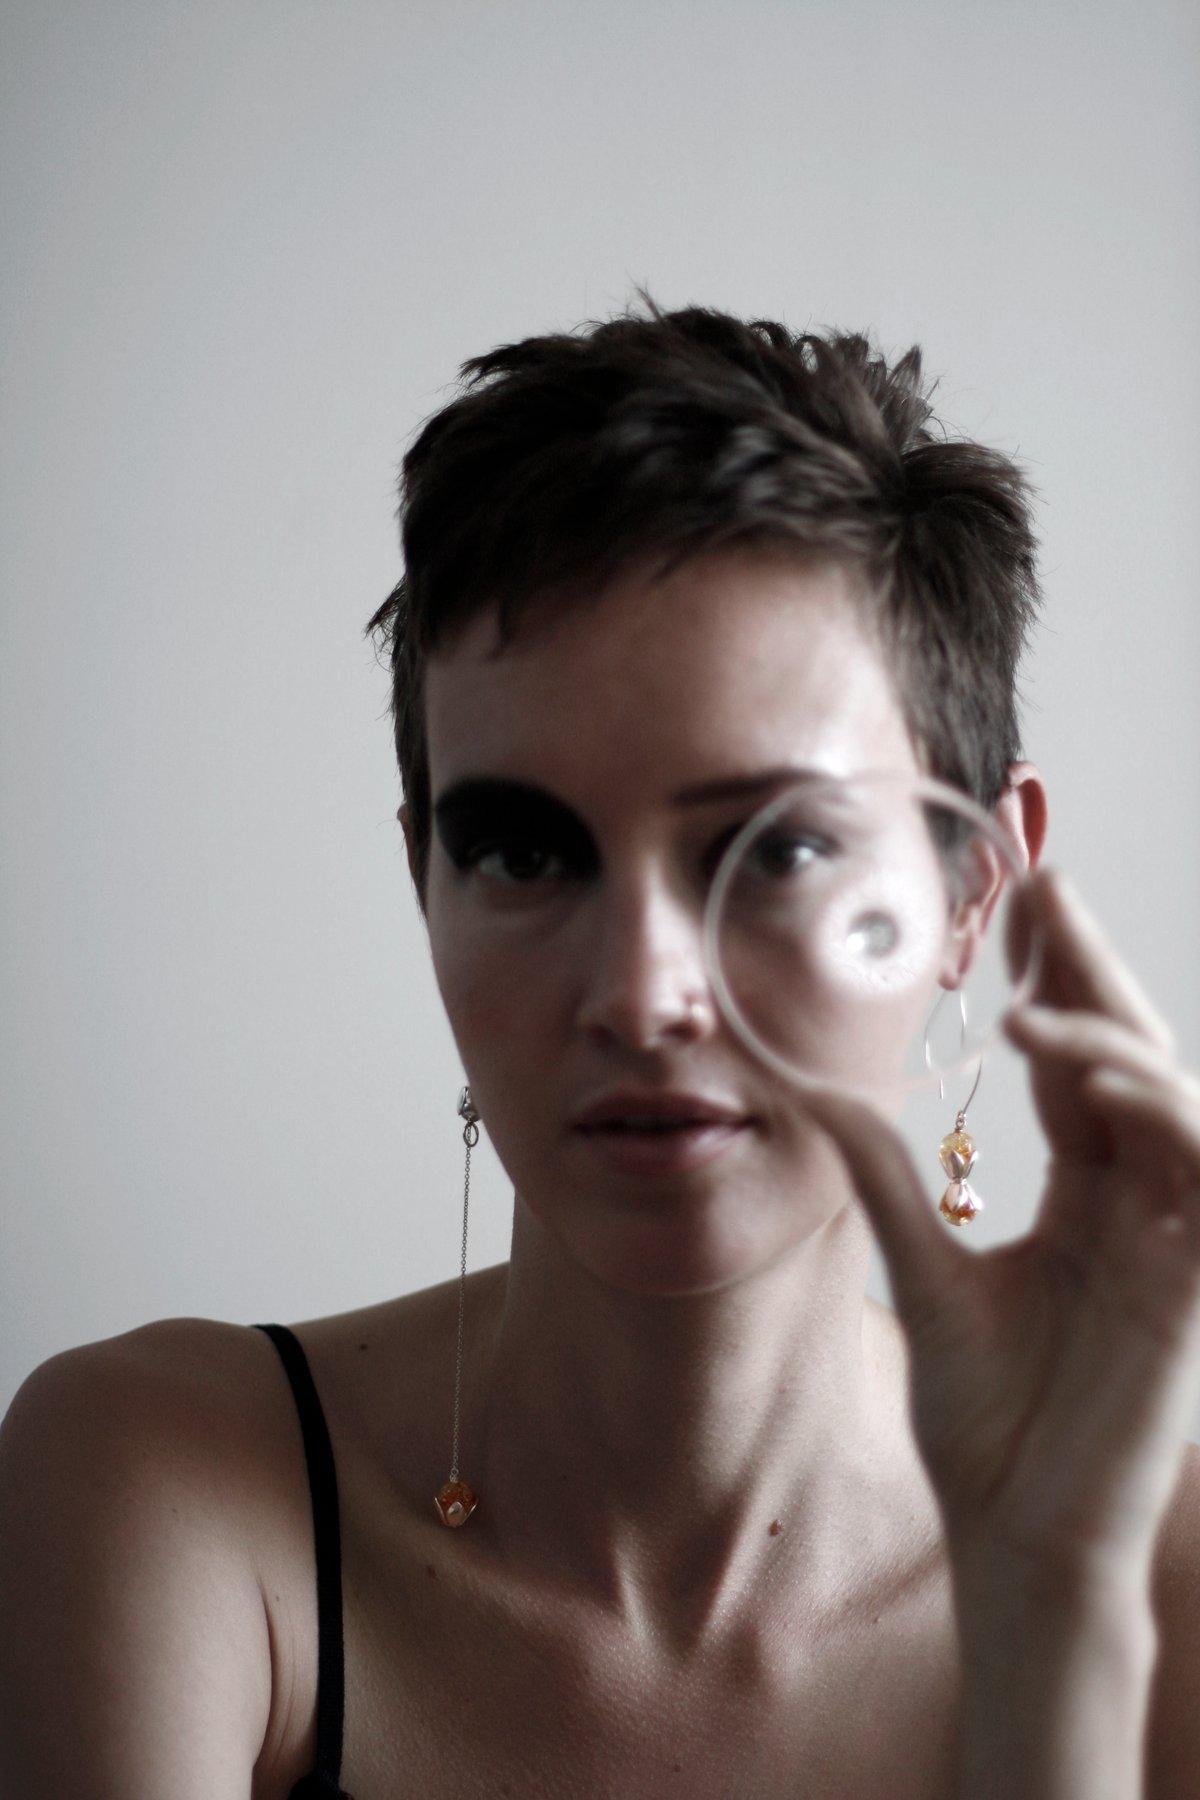 Image of Flying earrings